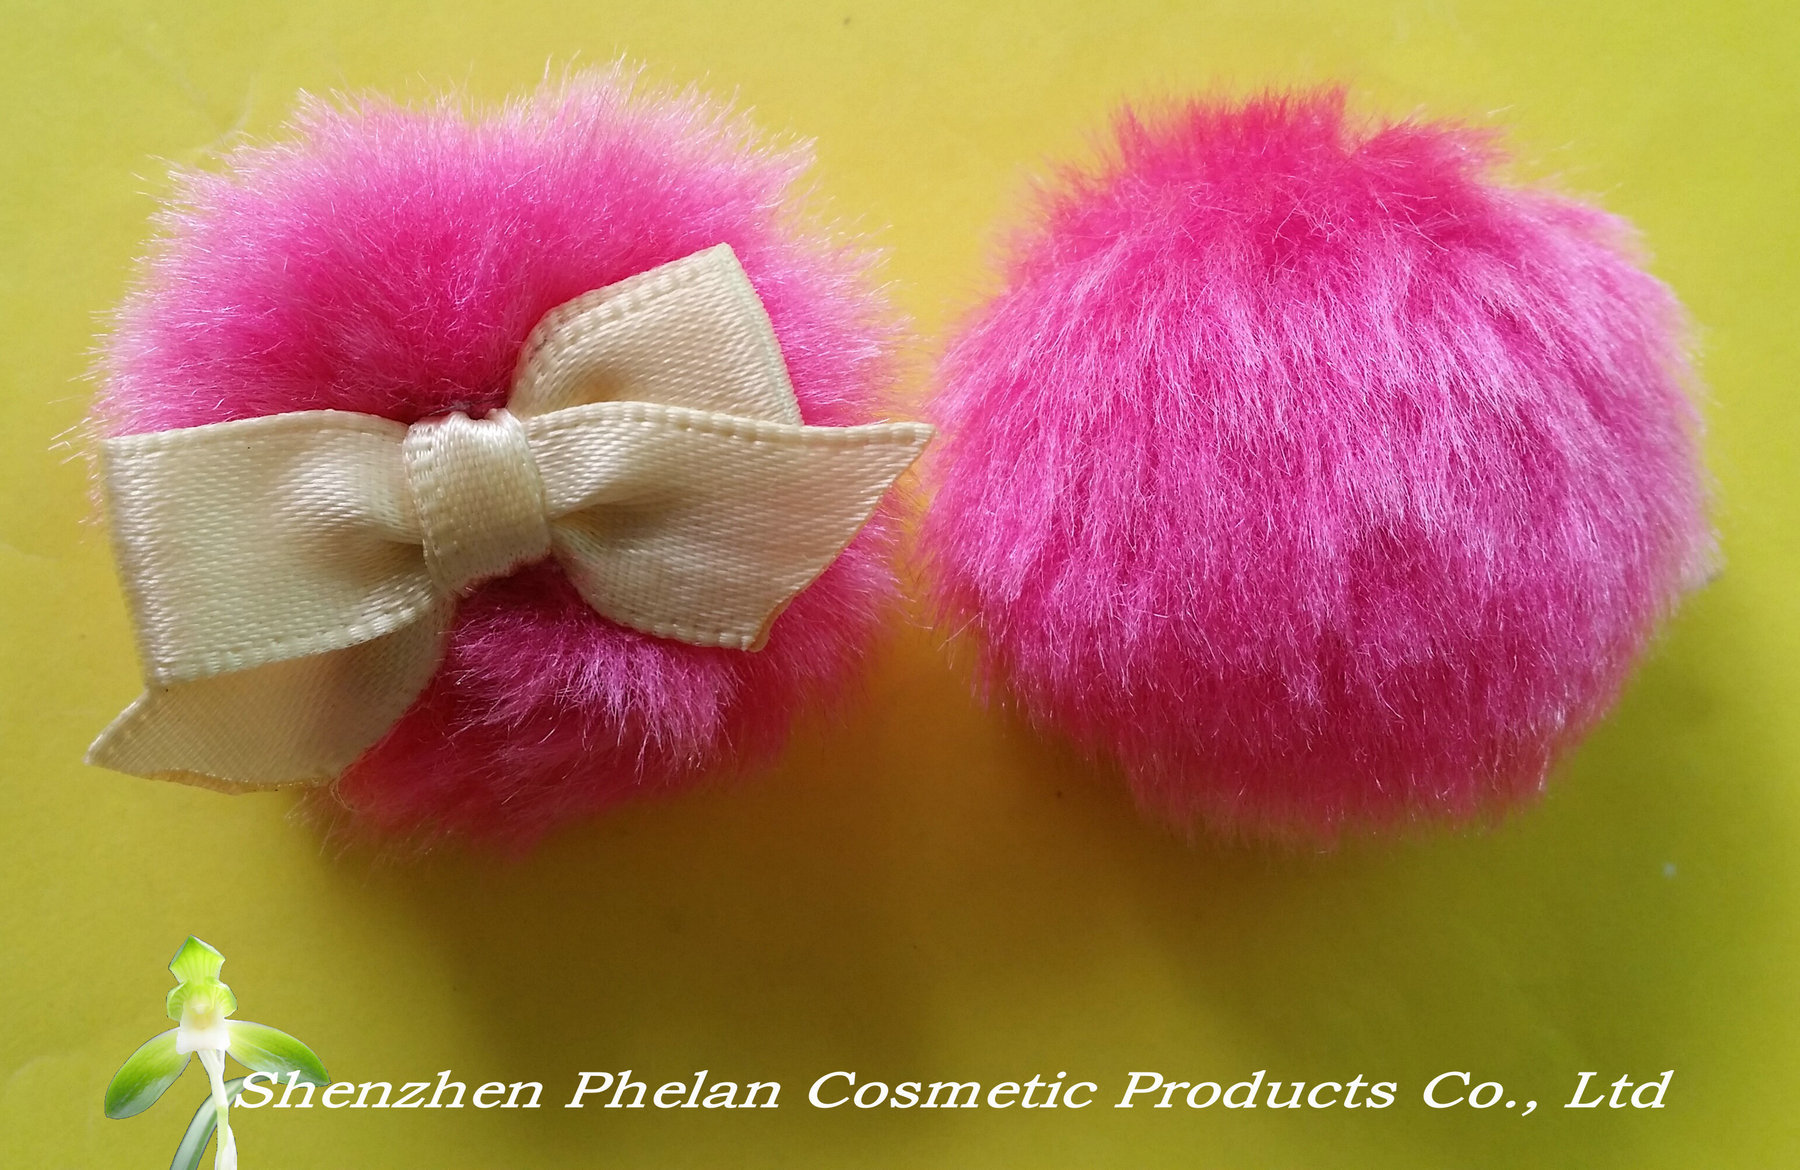 long plush puff, Heart-shaped puff,Plush Puff, Powder Puff, cosmetic powder puff,long velour powder